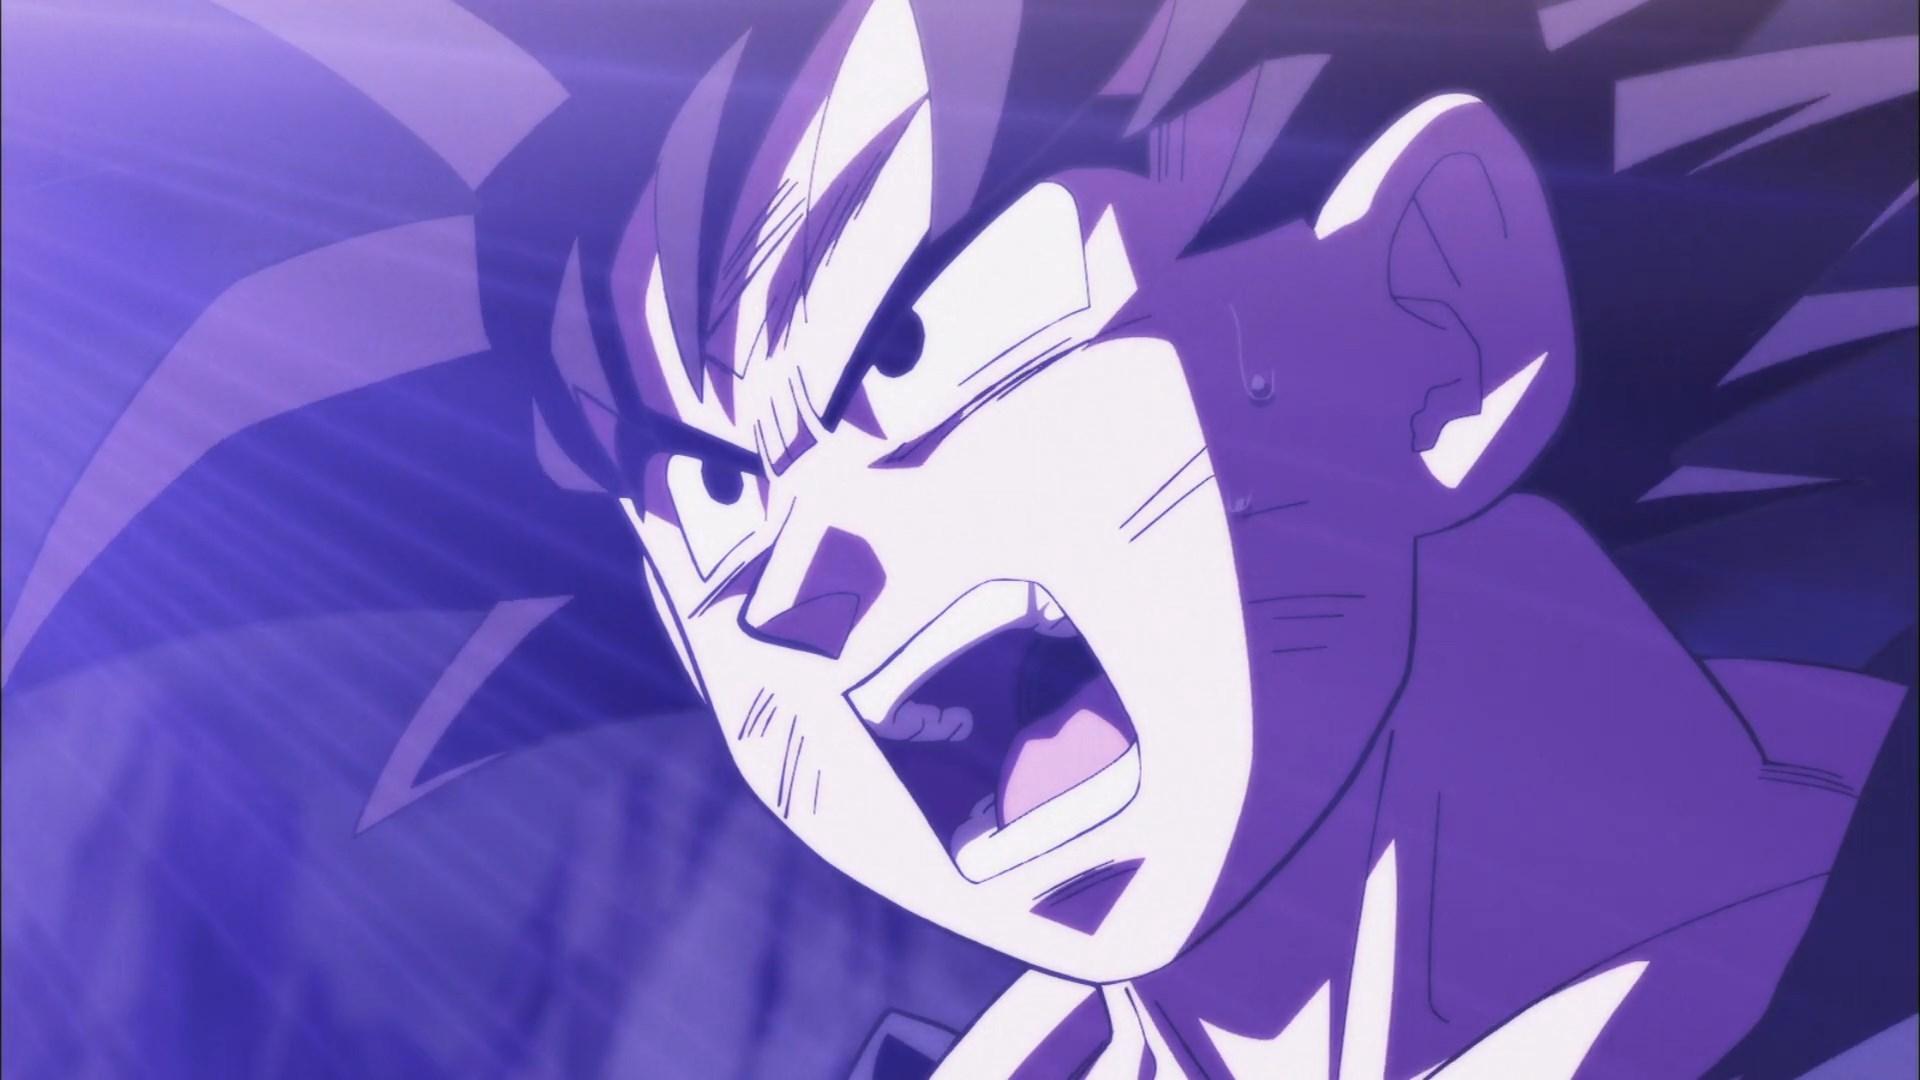 [HorribleSubs] Dragon Ball Super - 121 [1080p].mkv_snapshot_04.23